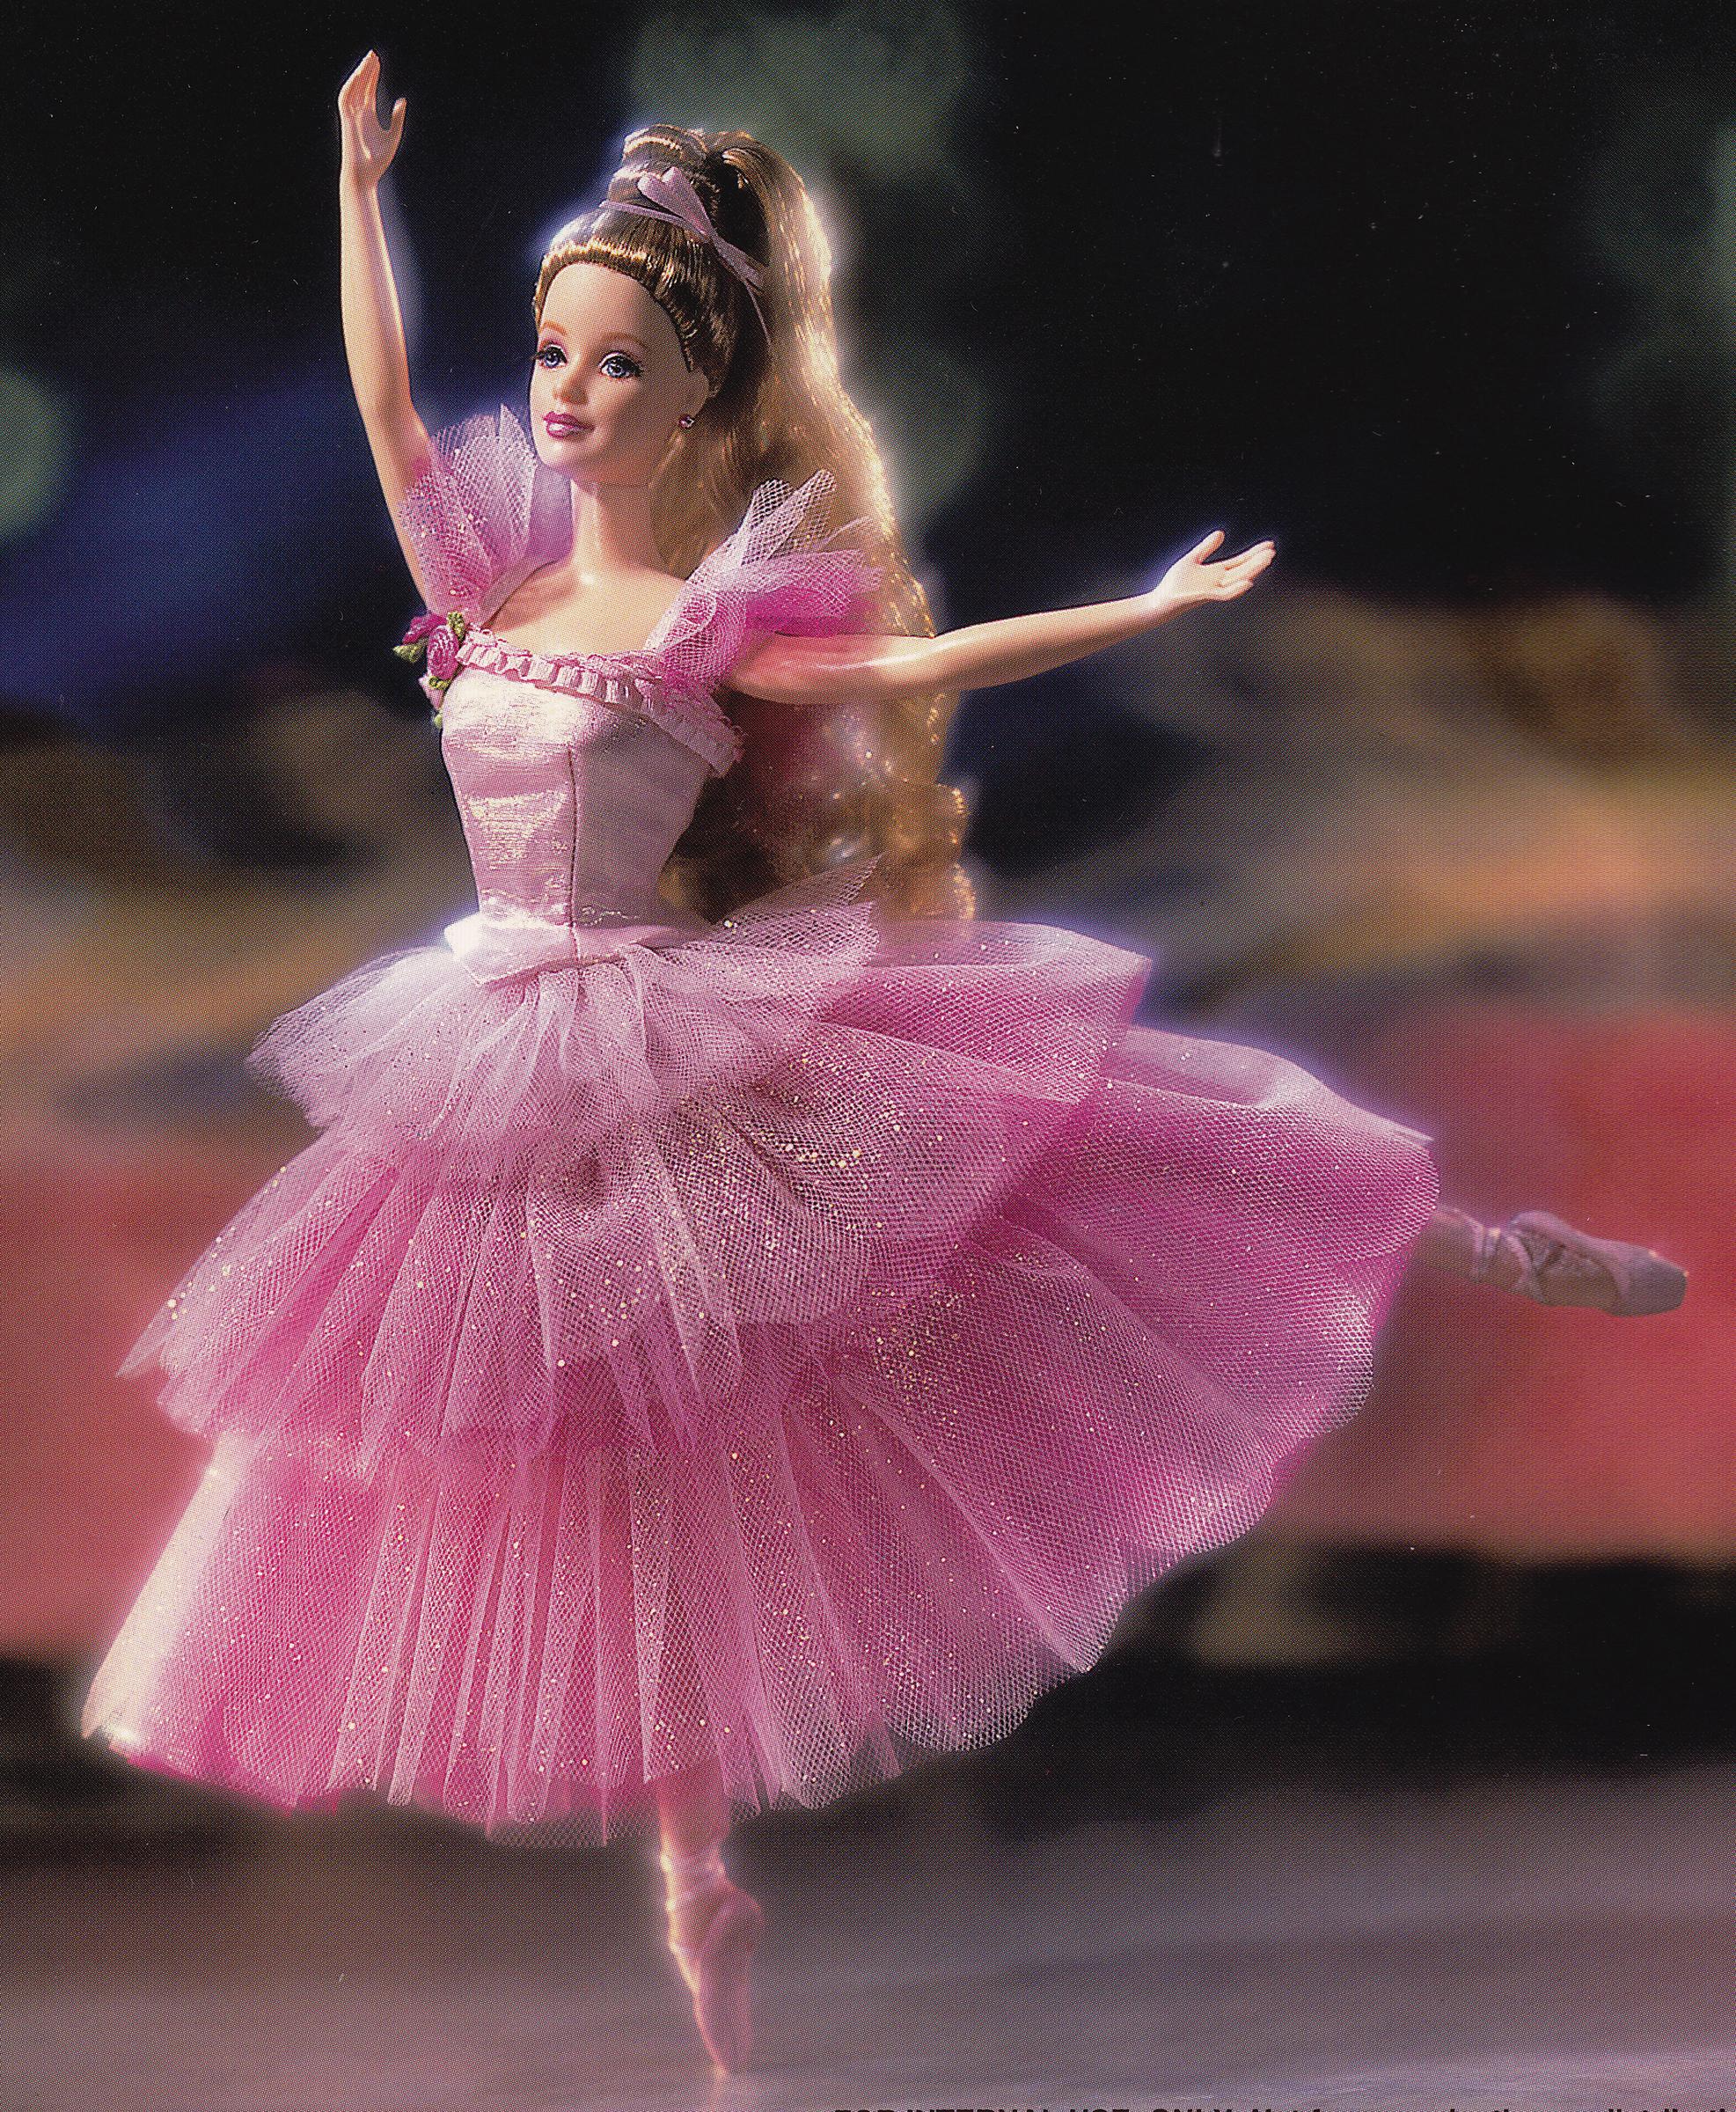 Barbie Doll as the Flower in the Nutcracker